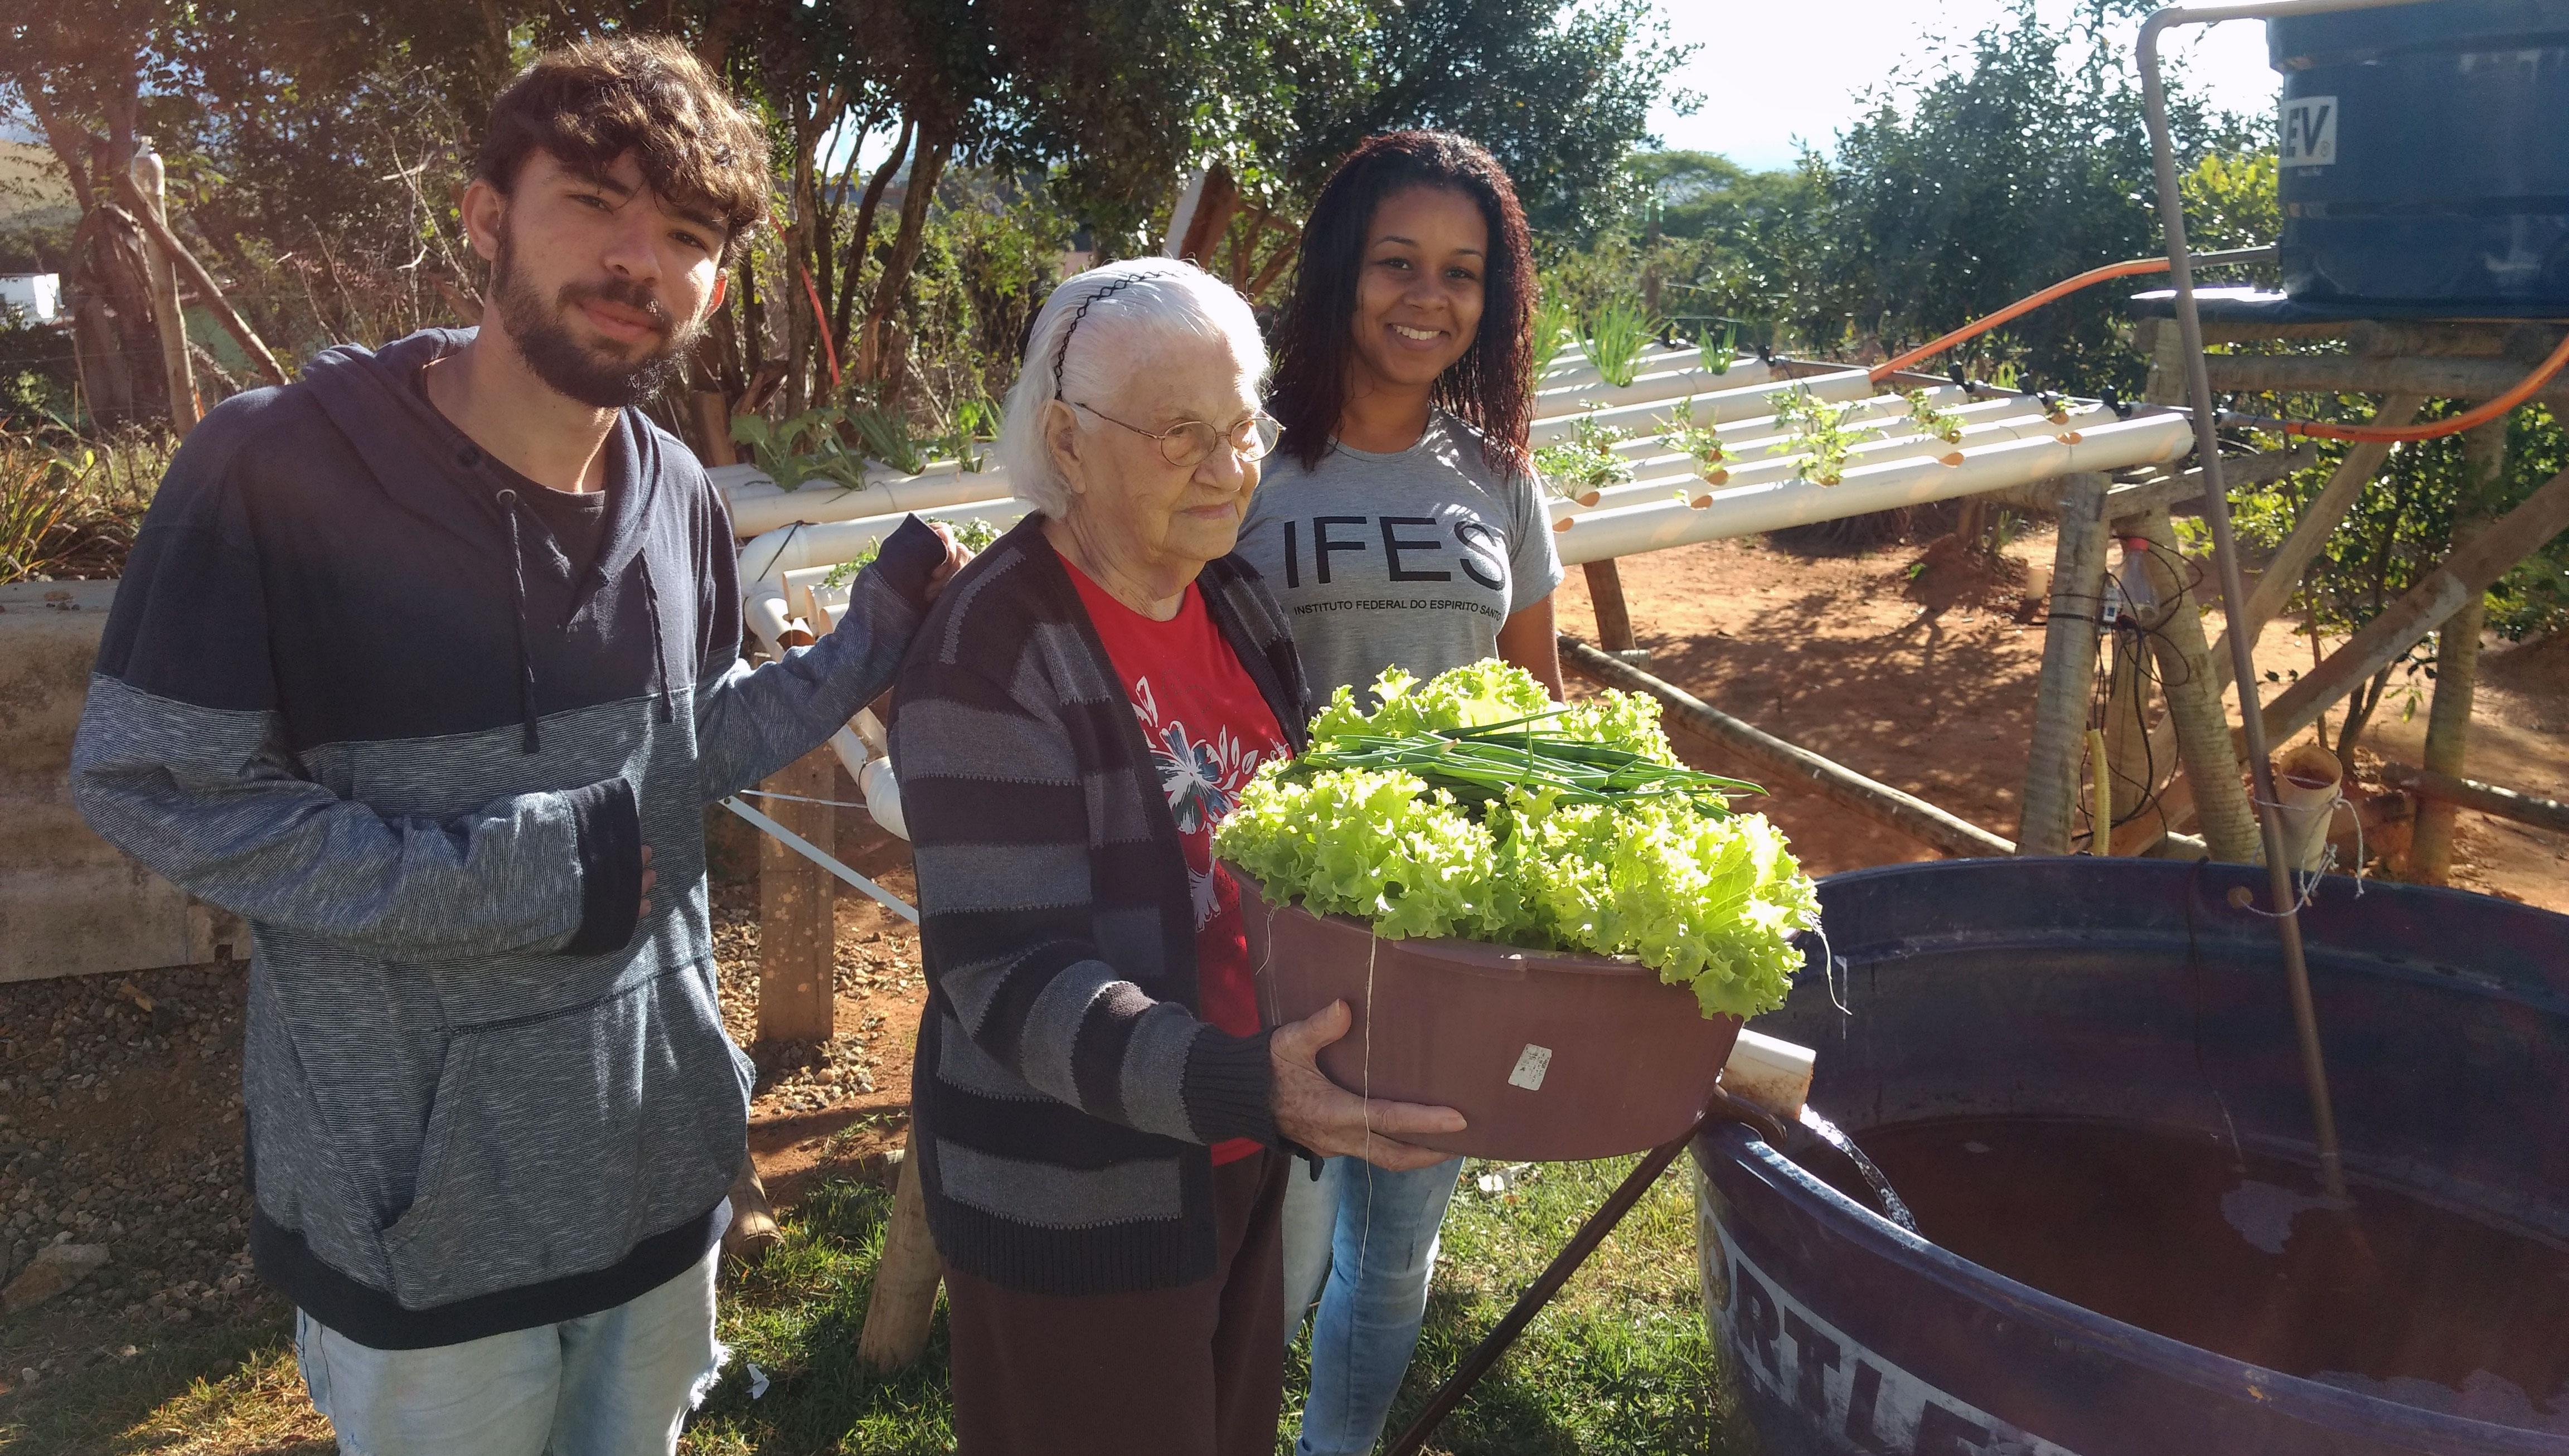 Projeto do Campus de Alegre leva peixes e hortaliças para idosos de Jerônimo Monteiro